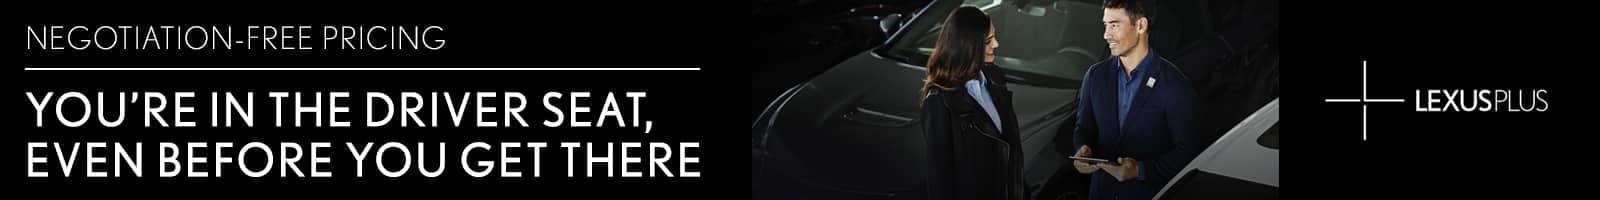 LexusPlus-1600x200